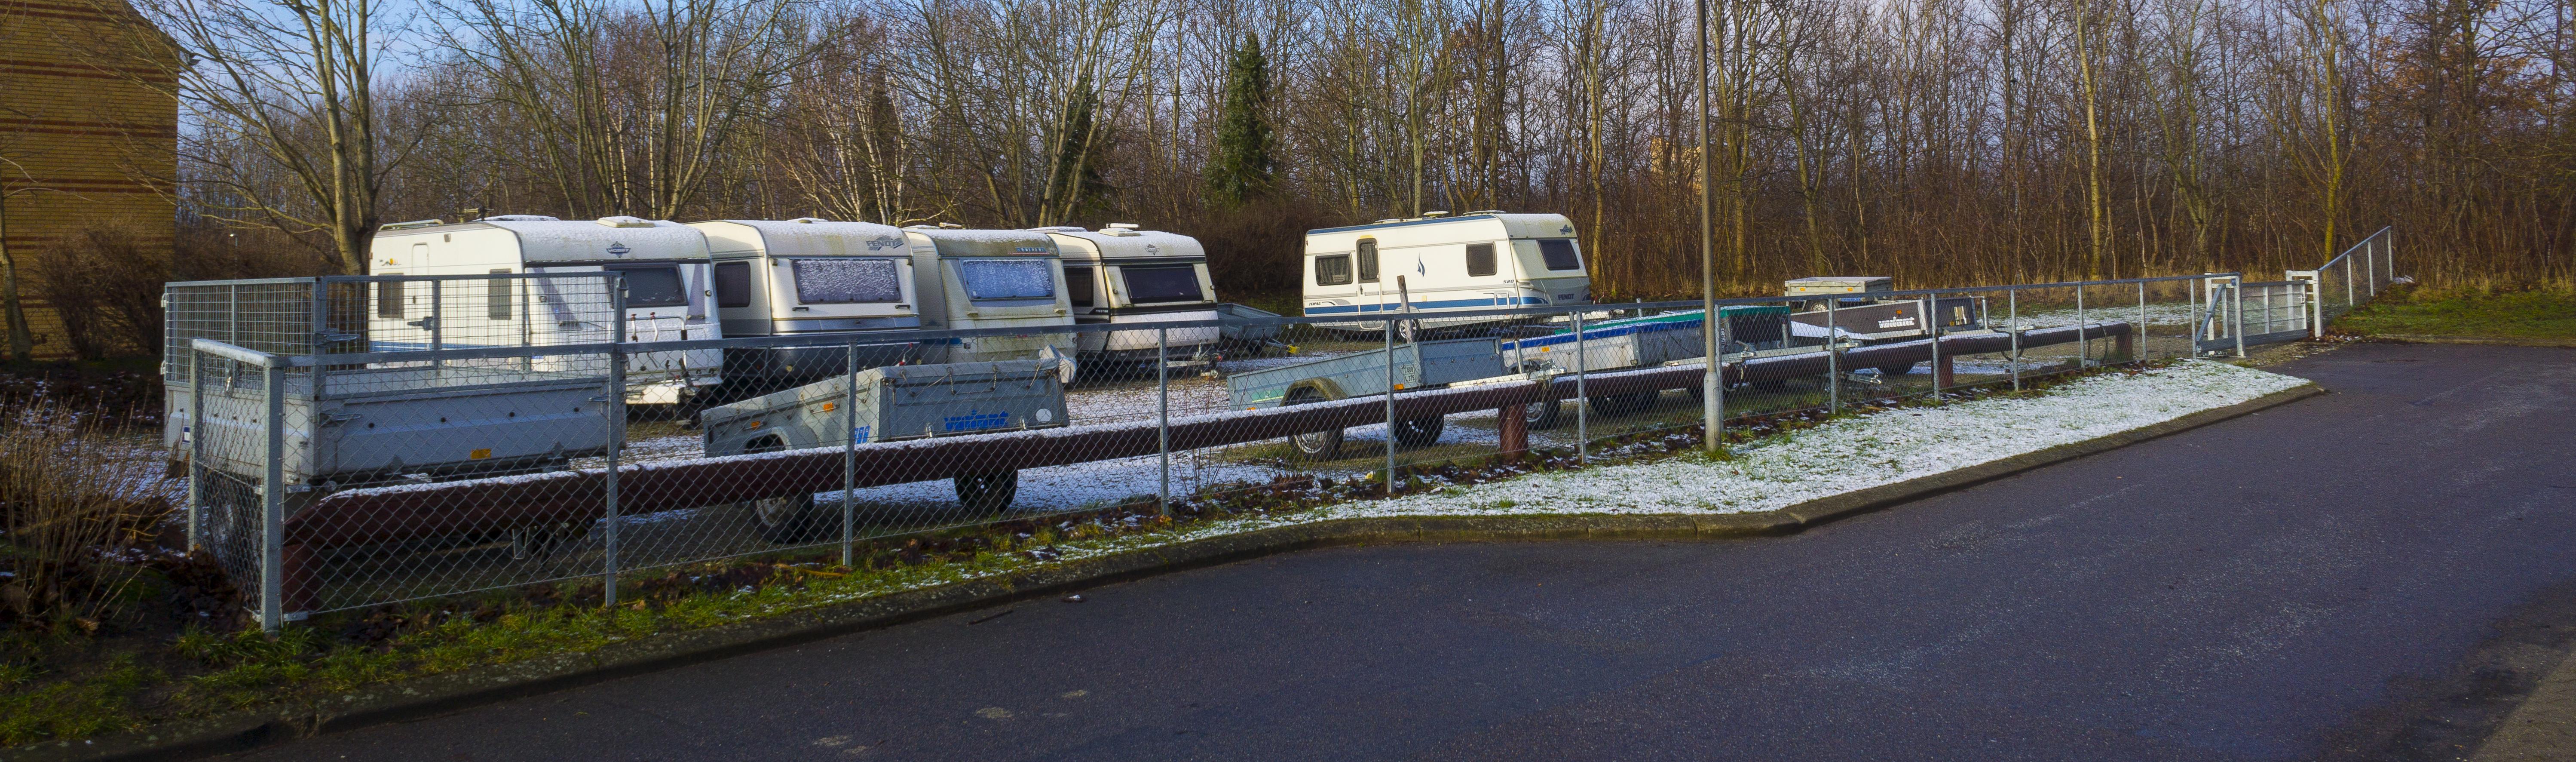 Campingparkering Snerlehaven / Moralhaven